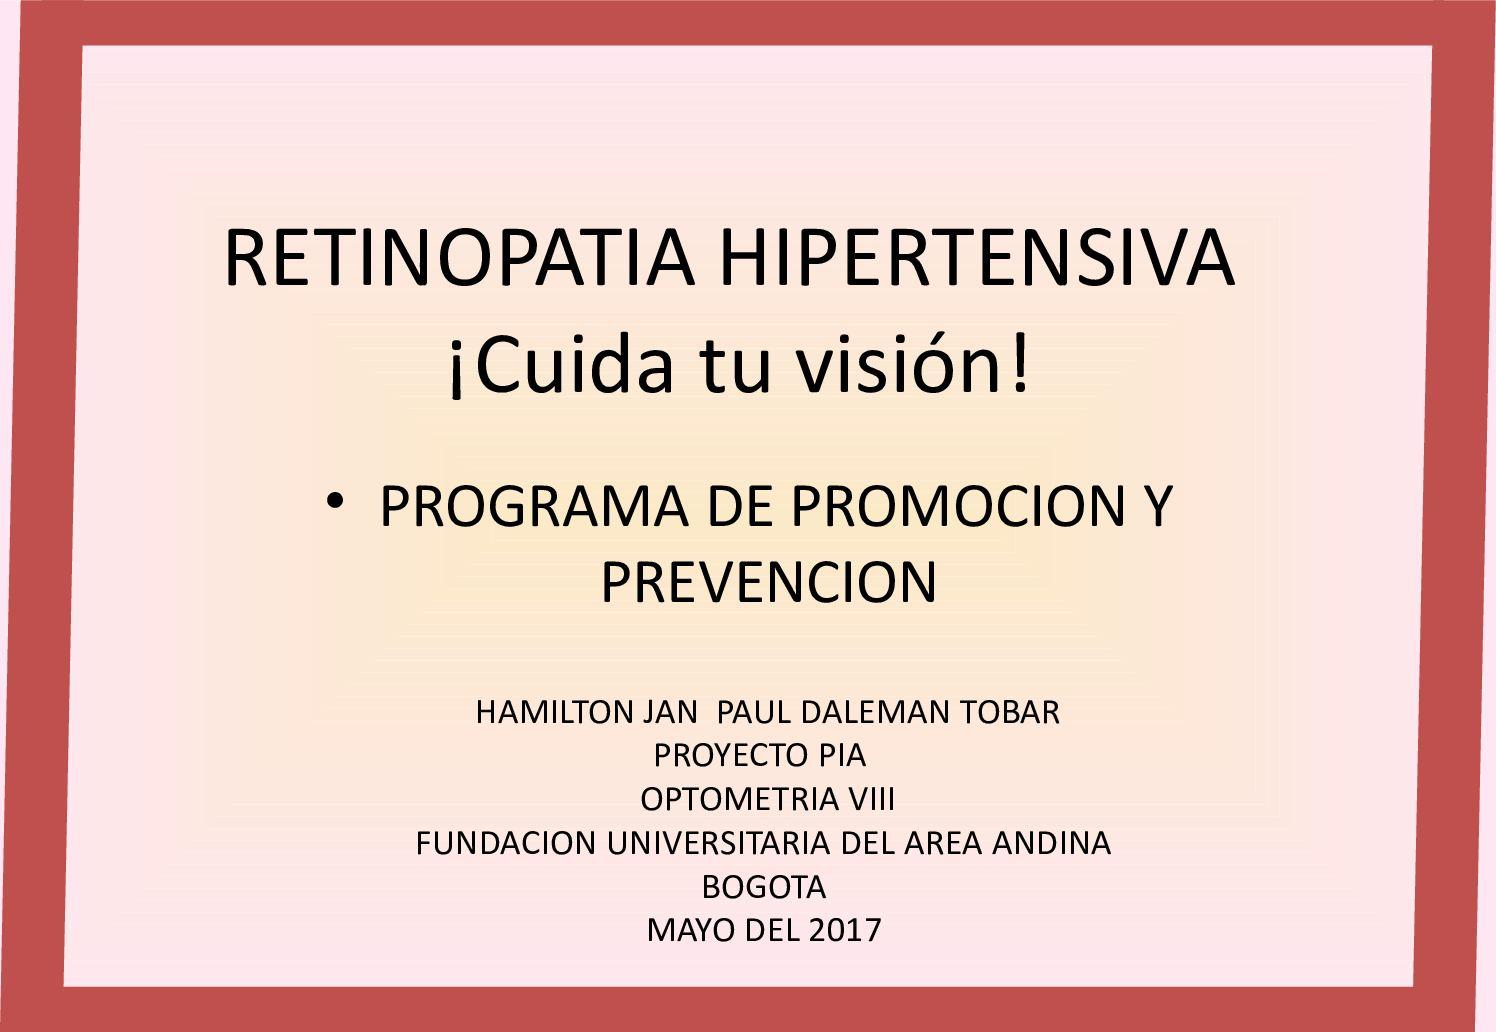 Patogenia de la retinopatía hipertensiva